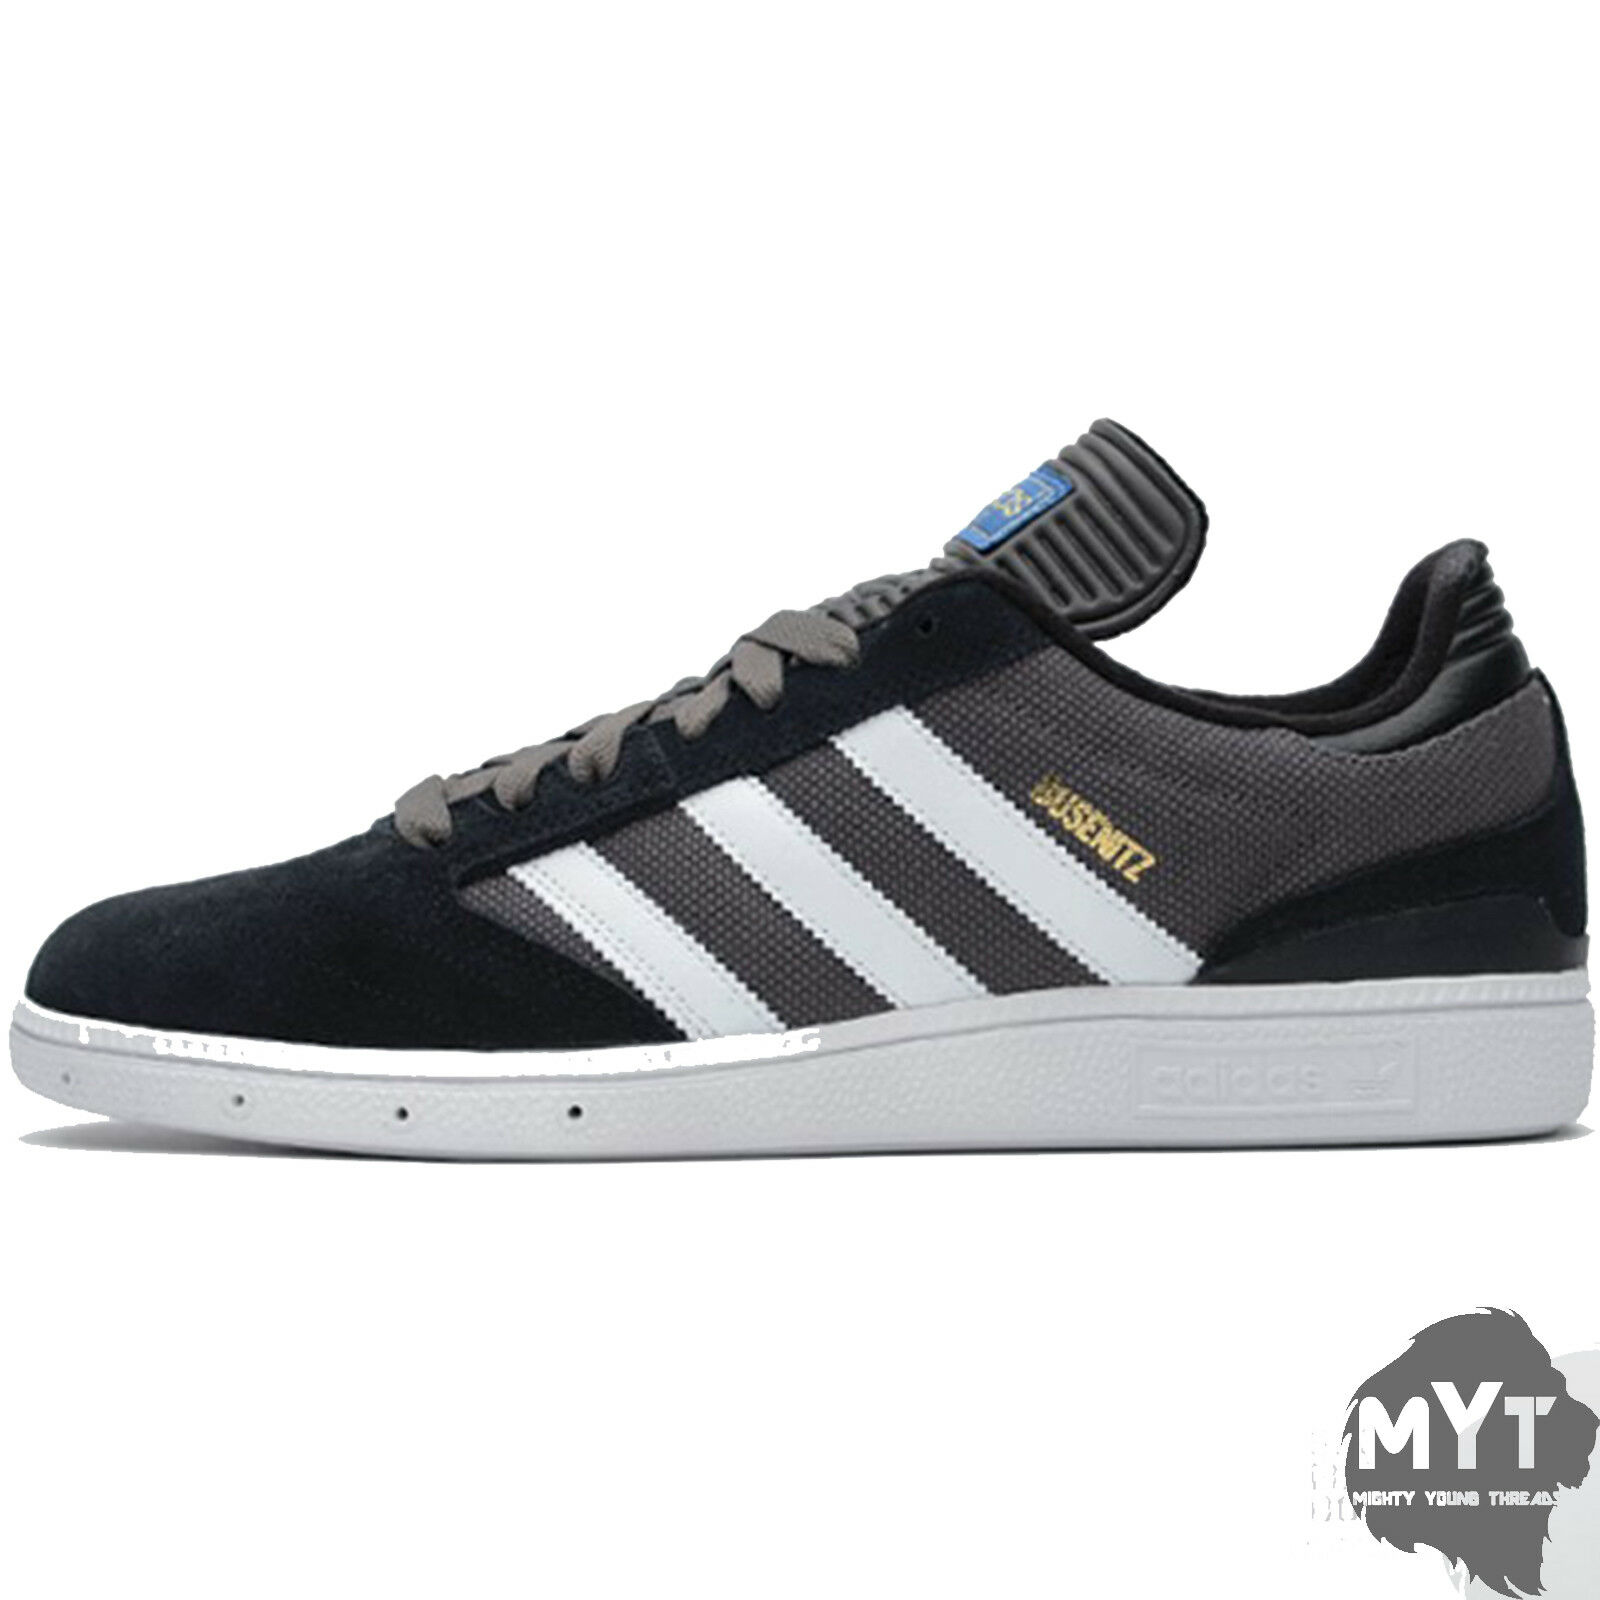 Nuove adidas originali busenitz mens tennis scarpe formatori nero grigio grigio grigio | modello di moda  | Gentiluomo/Signora Scarpa  843ac9